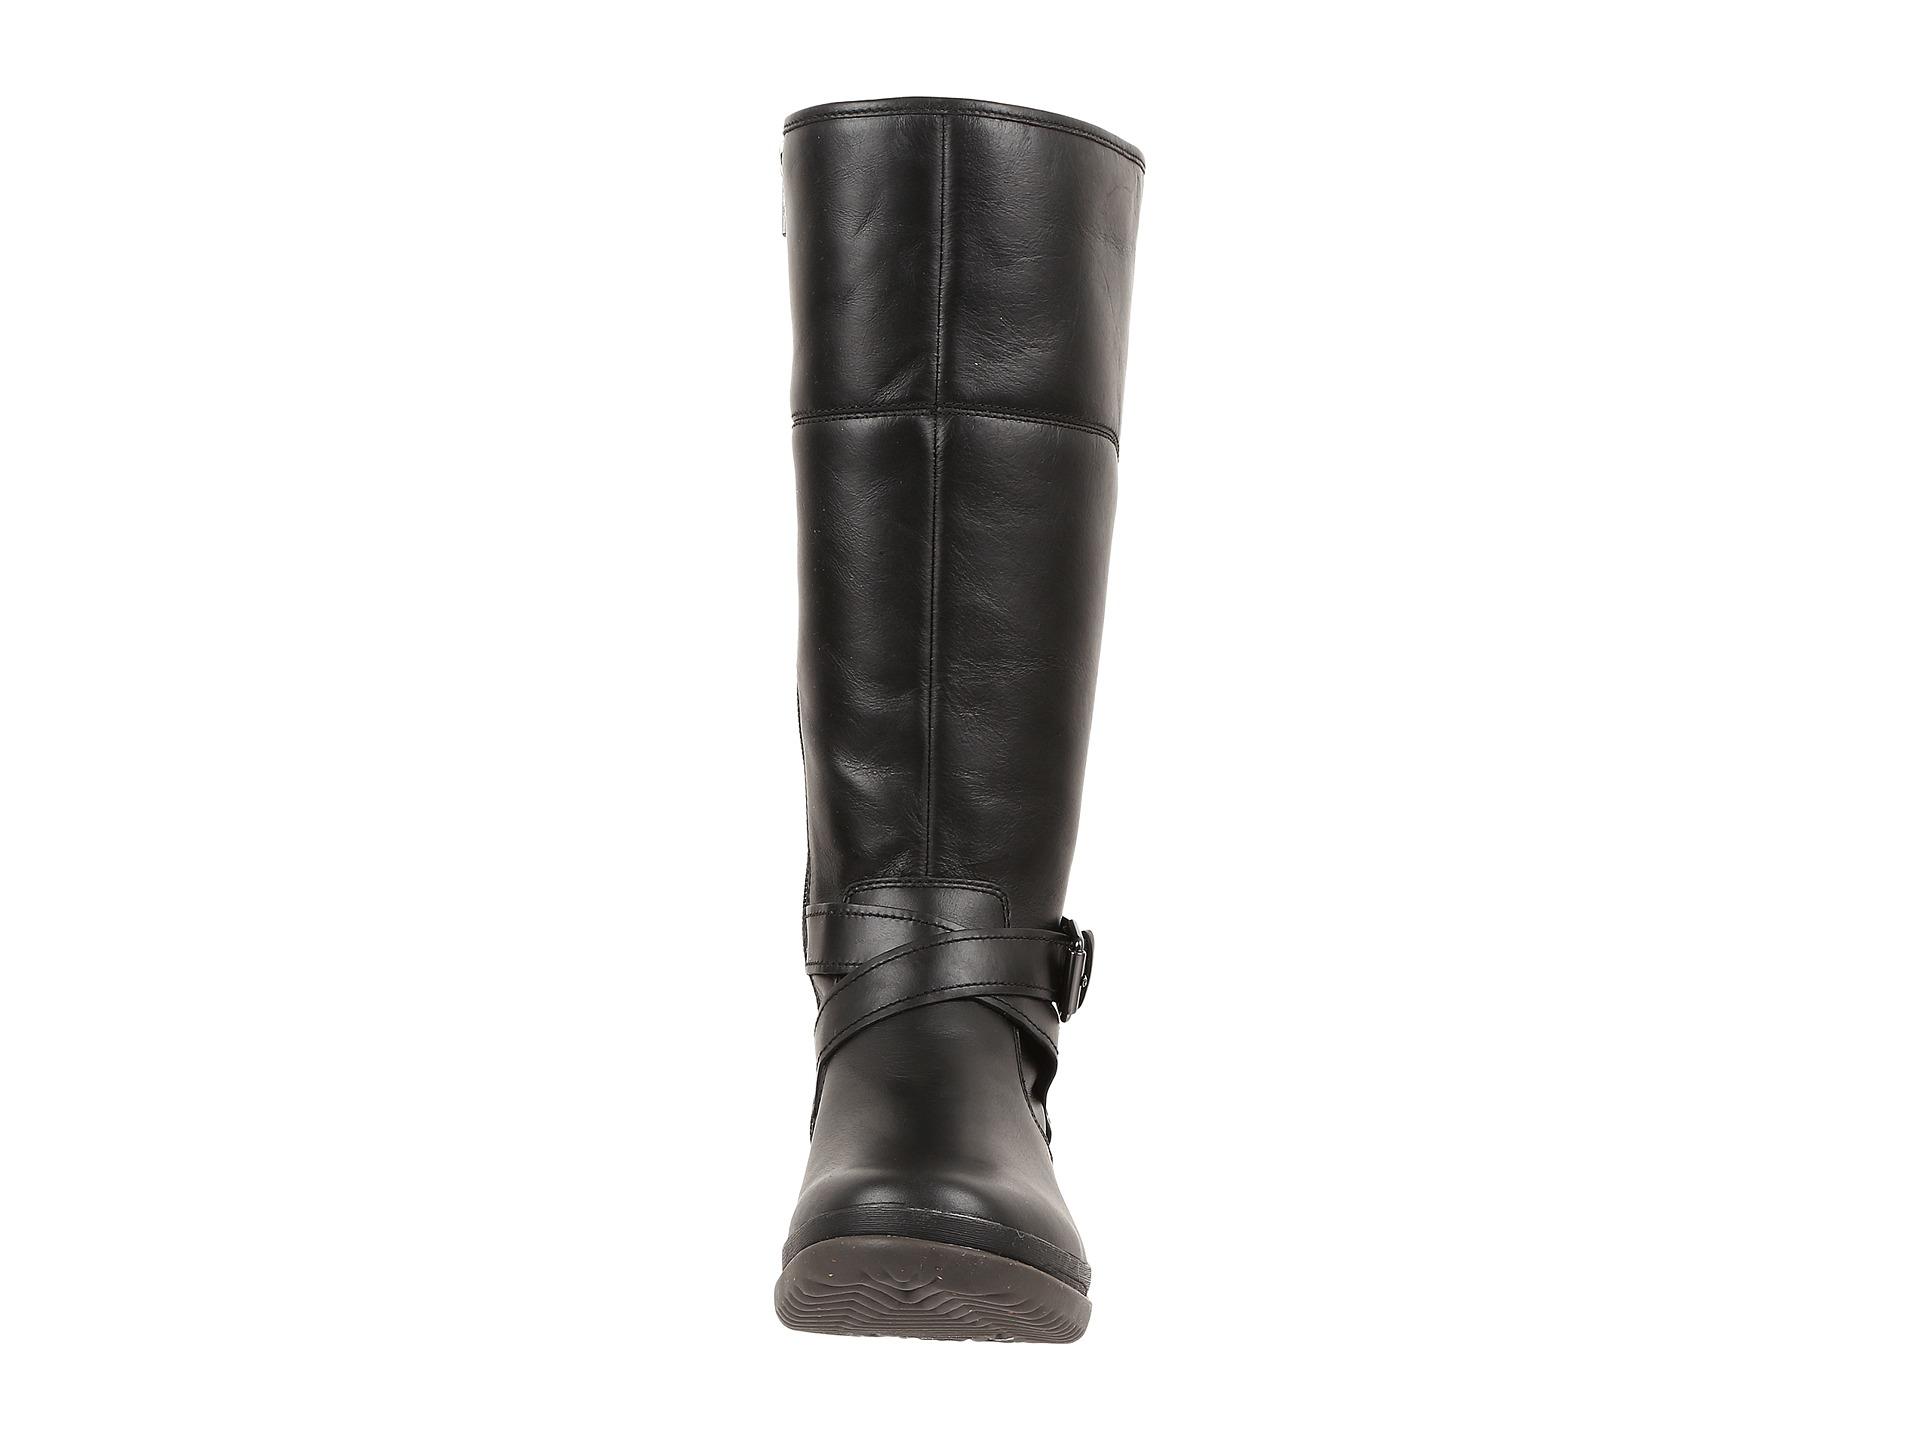 ff5a36c6e40 UGG Black Evanna Leather Riding Boots